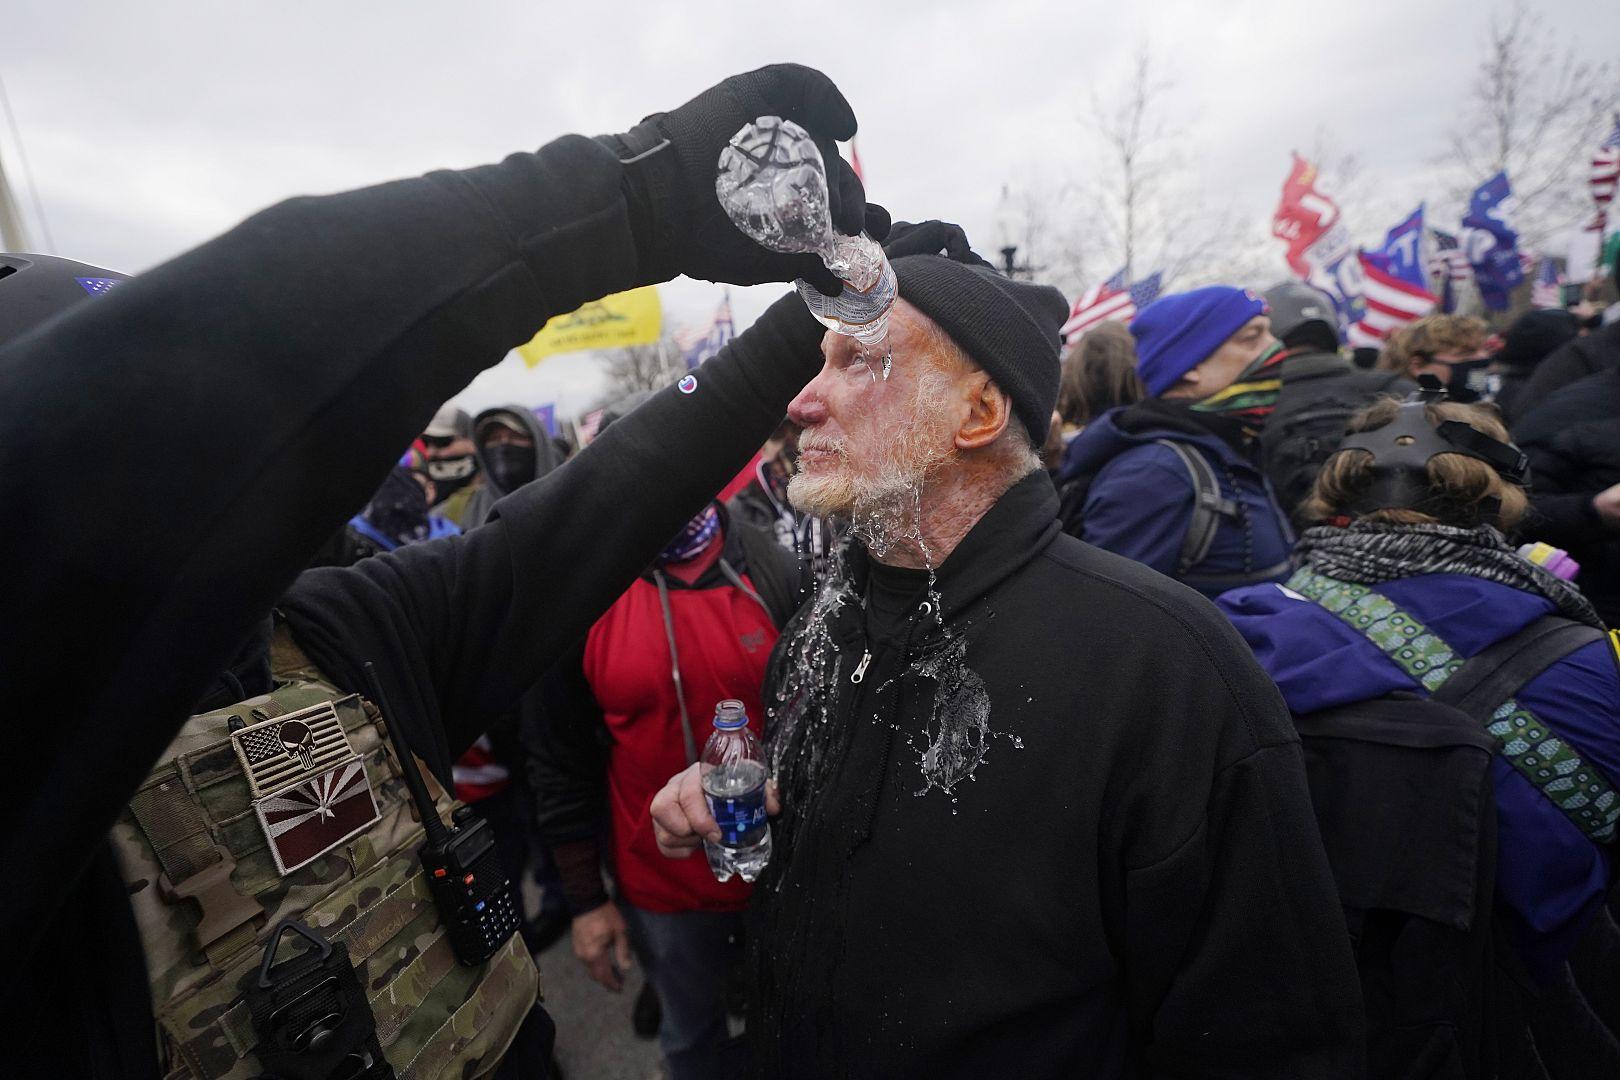 Seorang demonstran matanya dibilas dengan air setelah menghadapi polisi di Capitol di Washington, AS. 6 Januari 2021